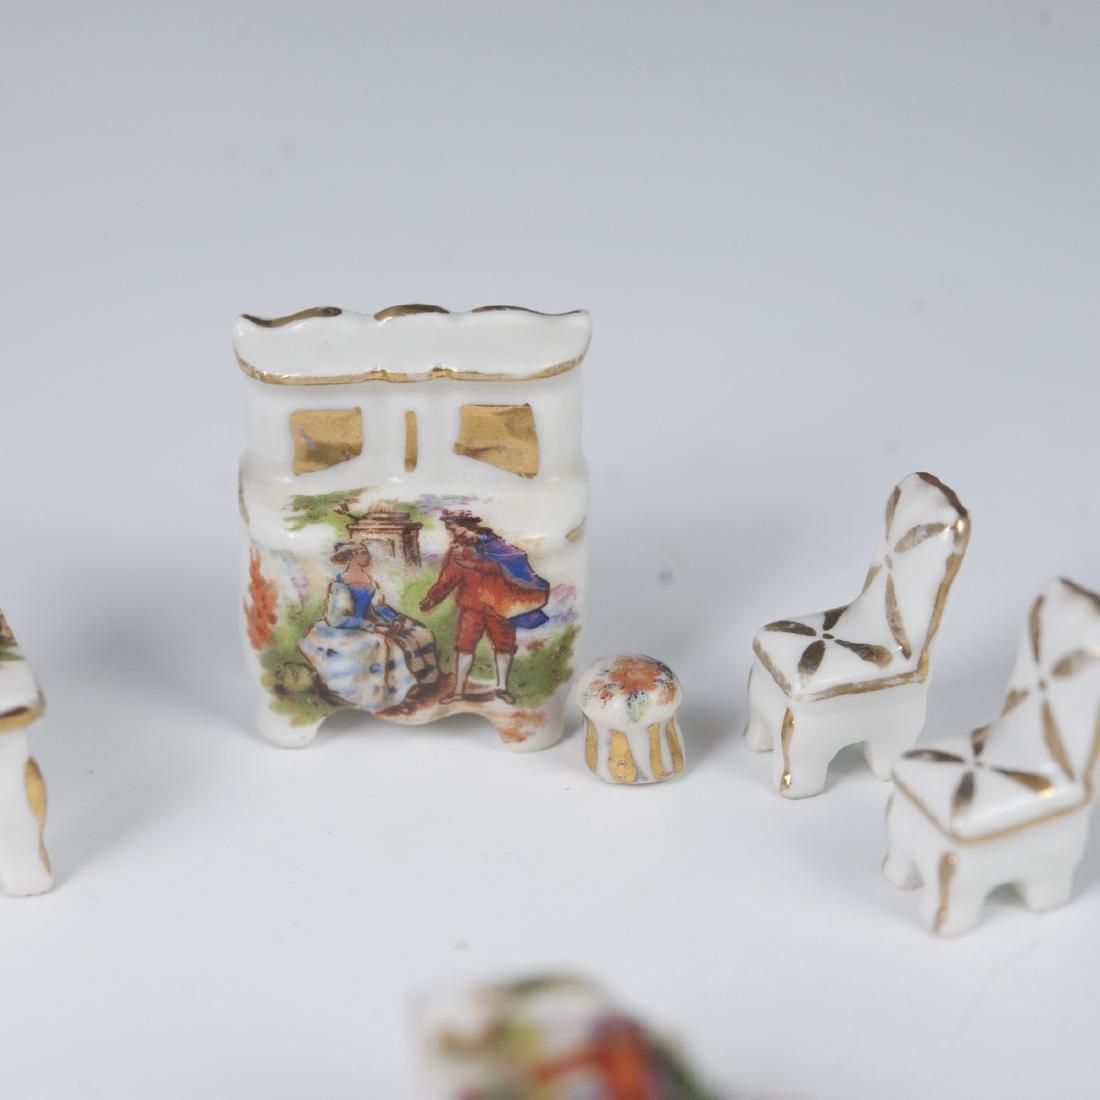 Limoges Porcelain Dollhouse Set - 2